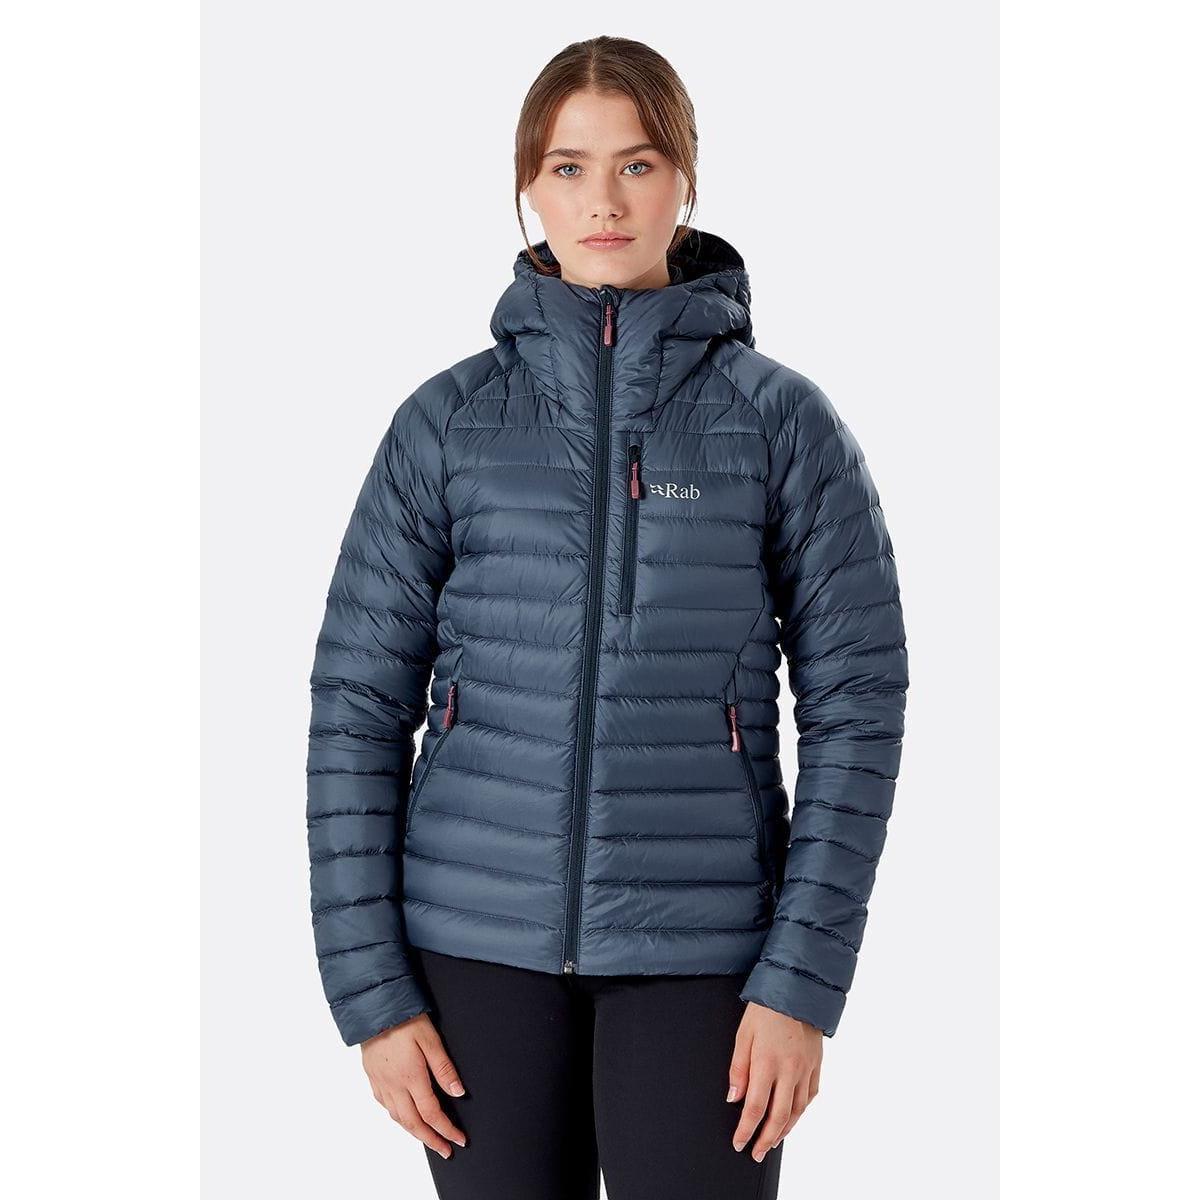 Rab Women's Rab Microlight Alpine Jacket - Grey